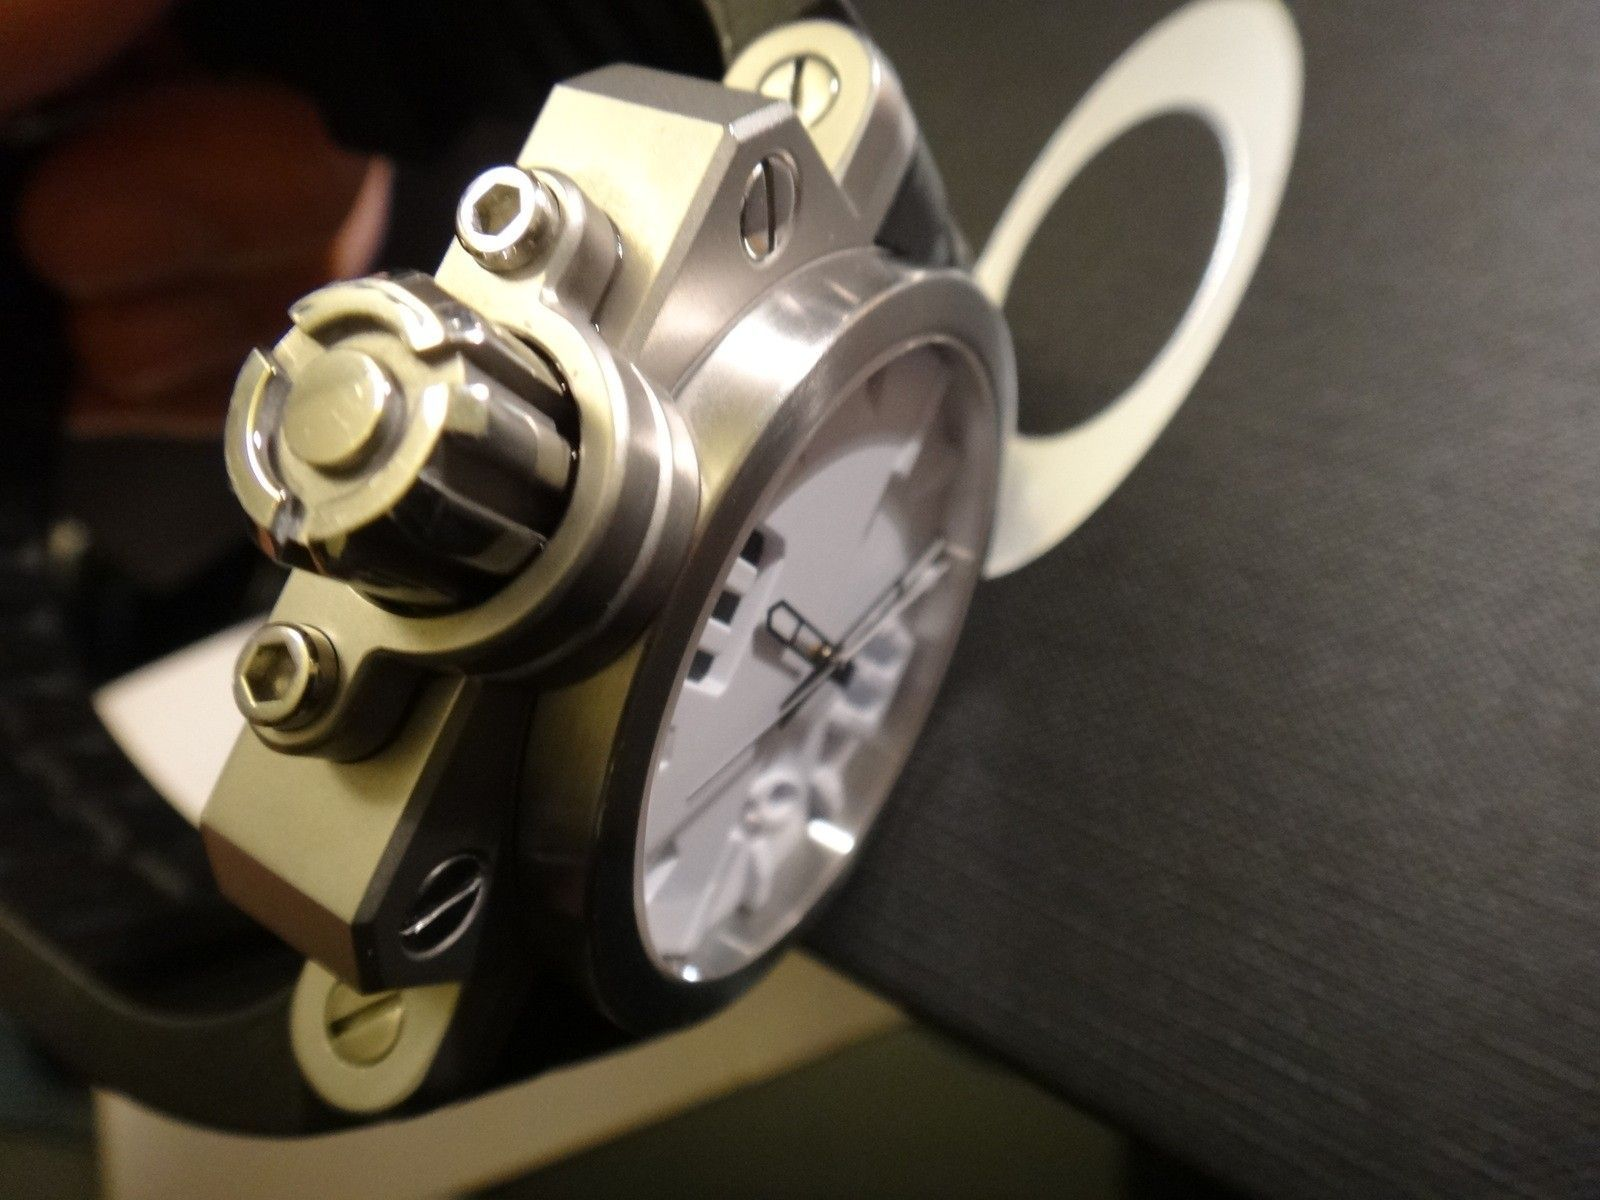 Oakley Gearbox brushed WHITE dial 10-064 stainless steel - DSC05724.JPG